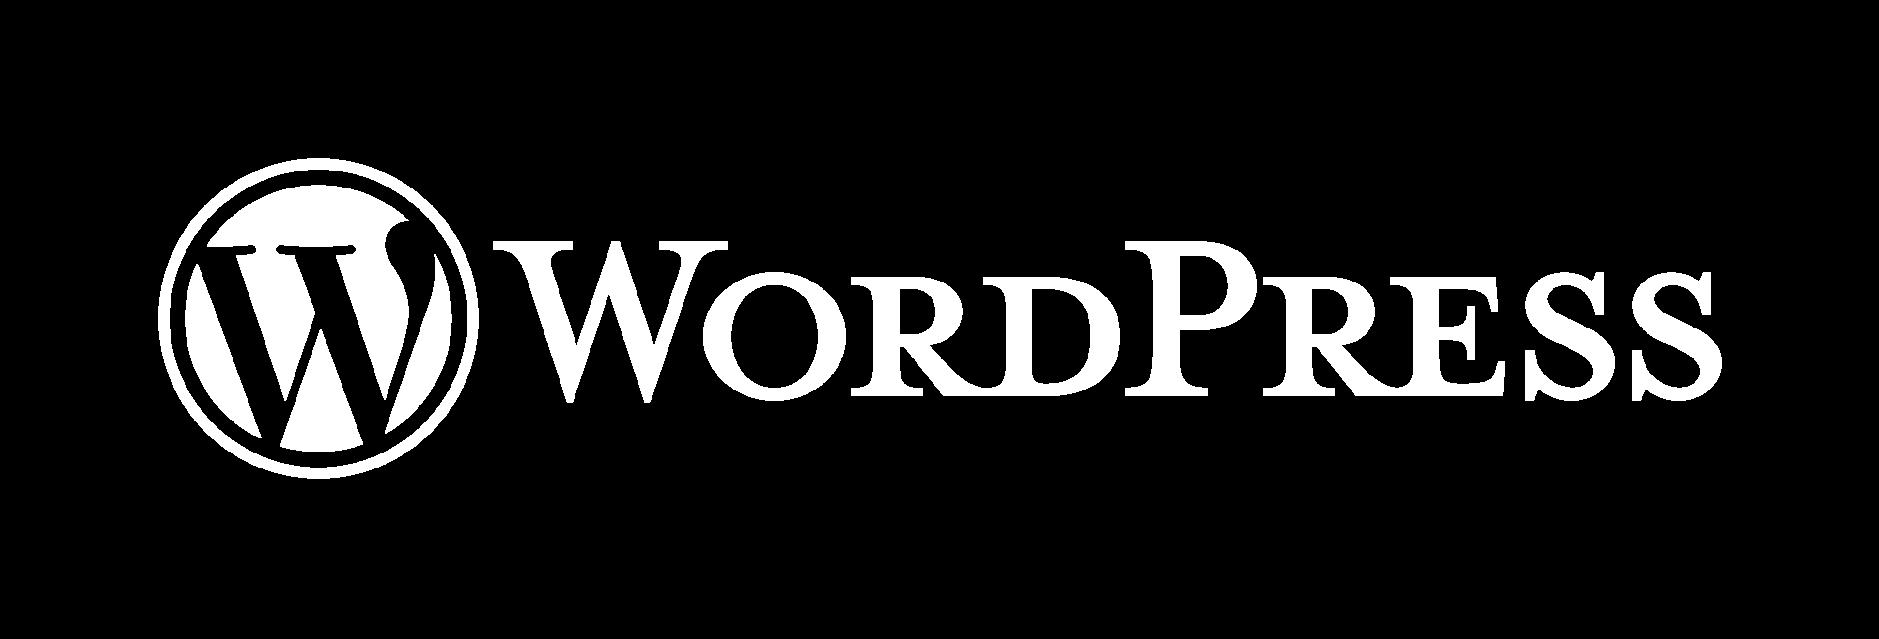 WordPressでサイト作成